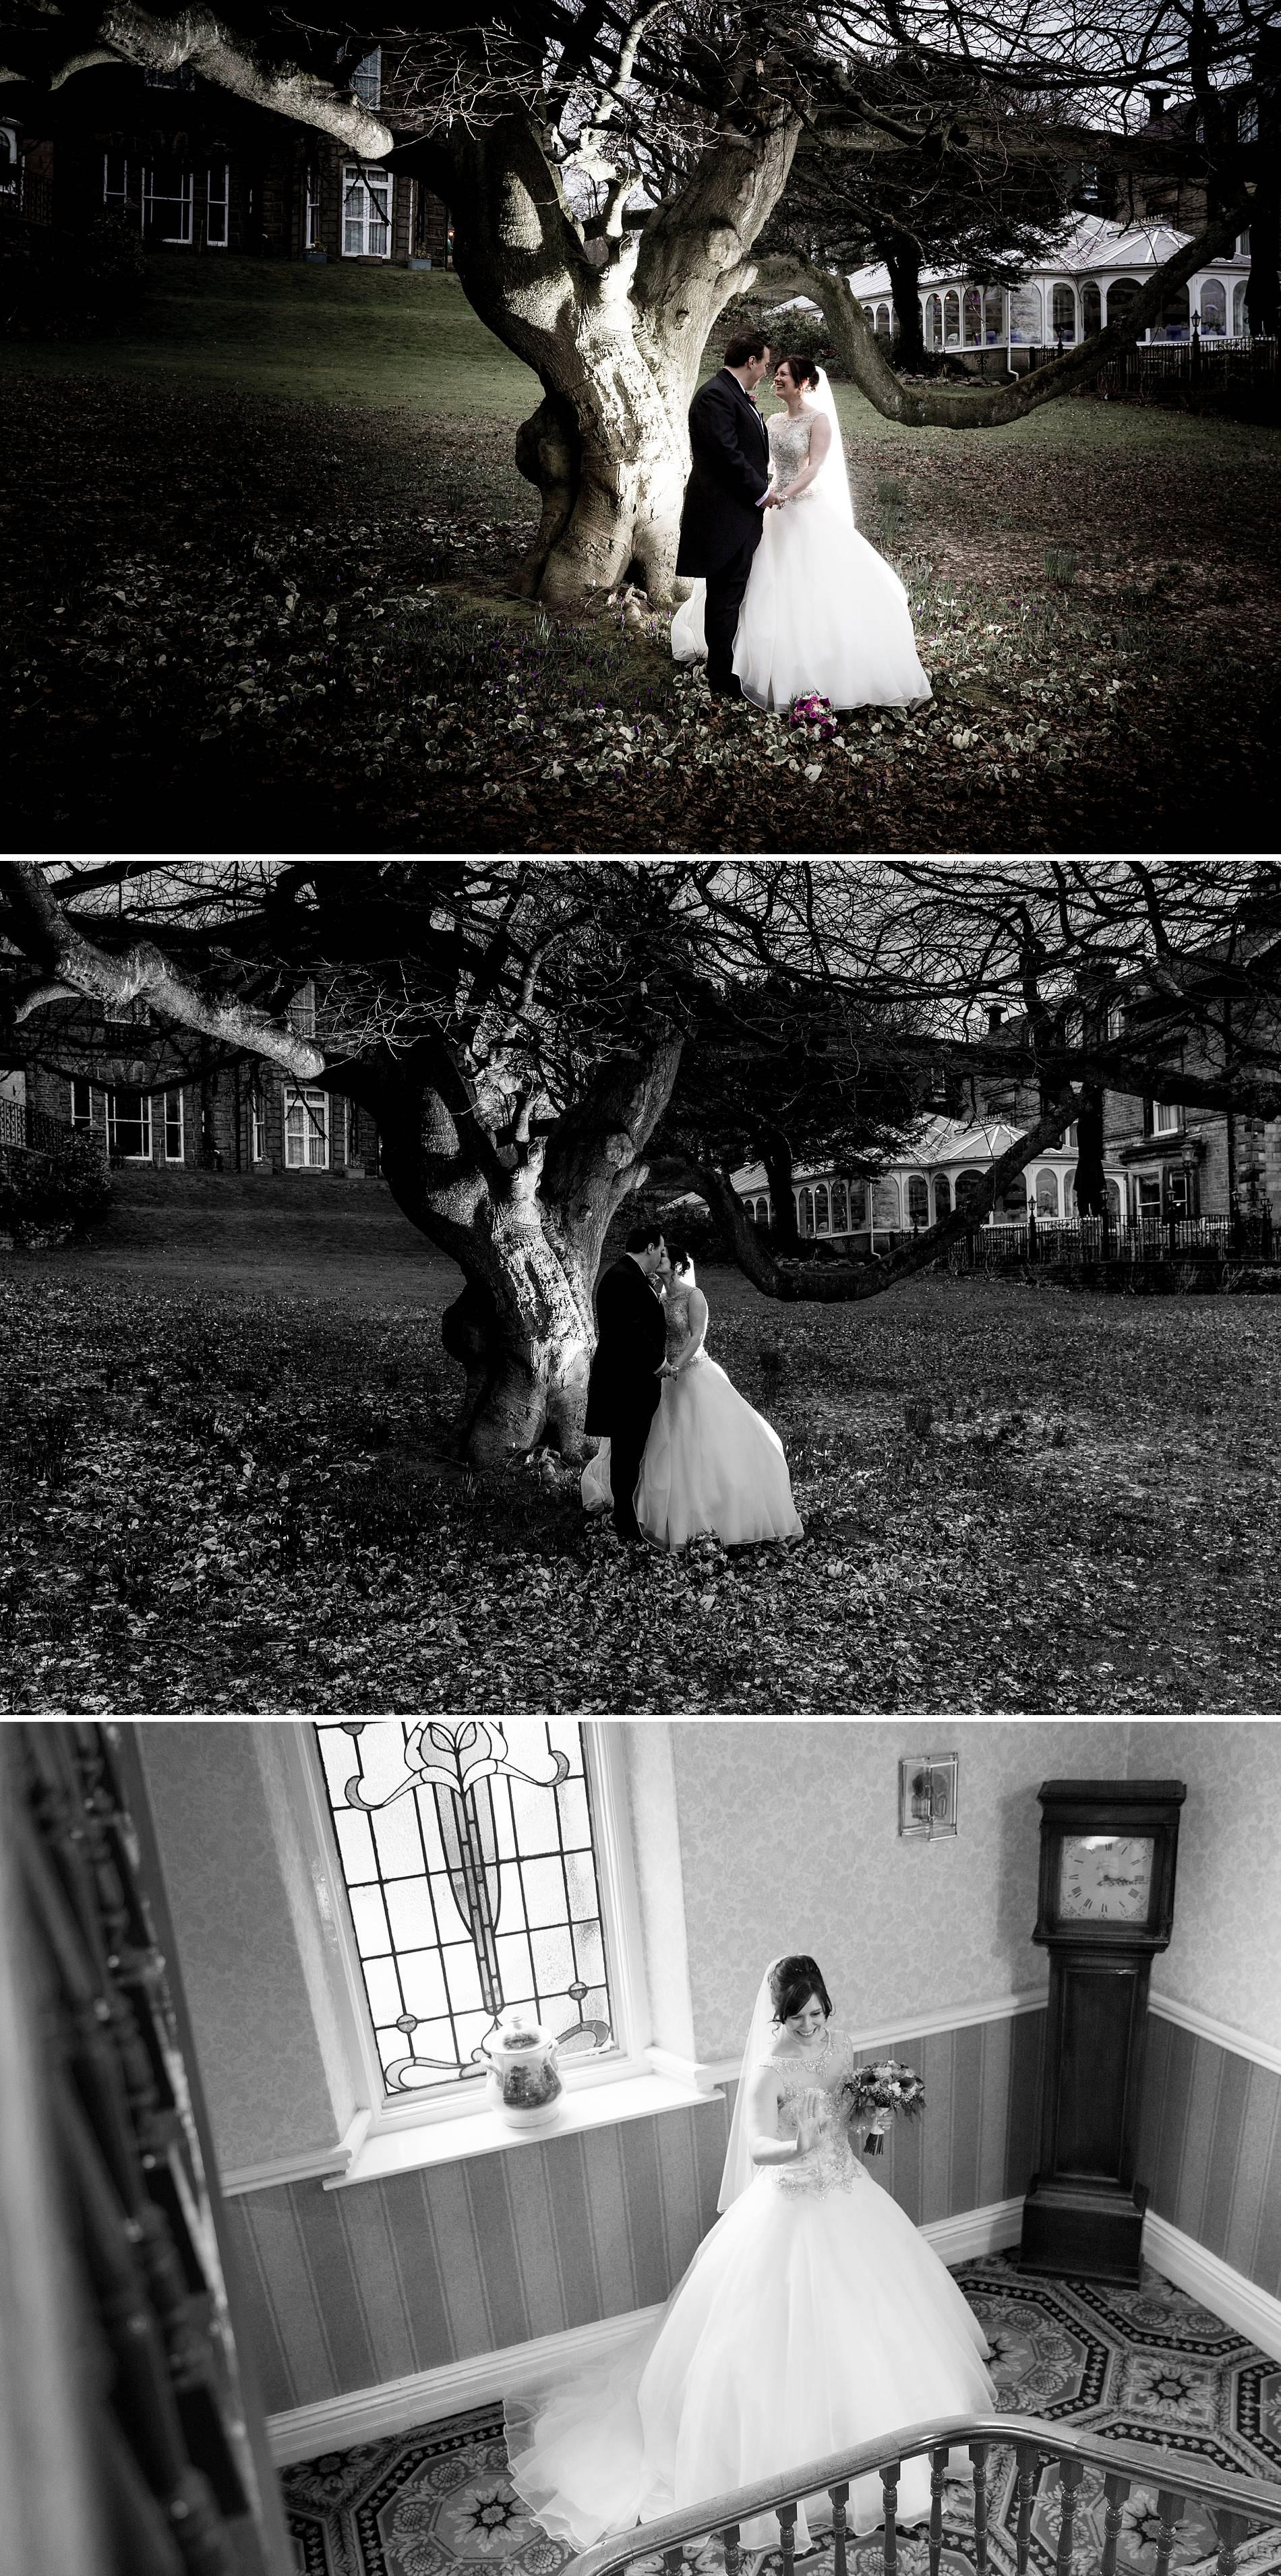 wedding photographer in kent for creative photos